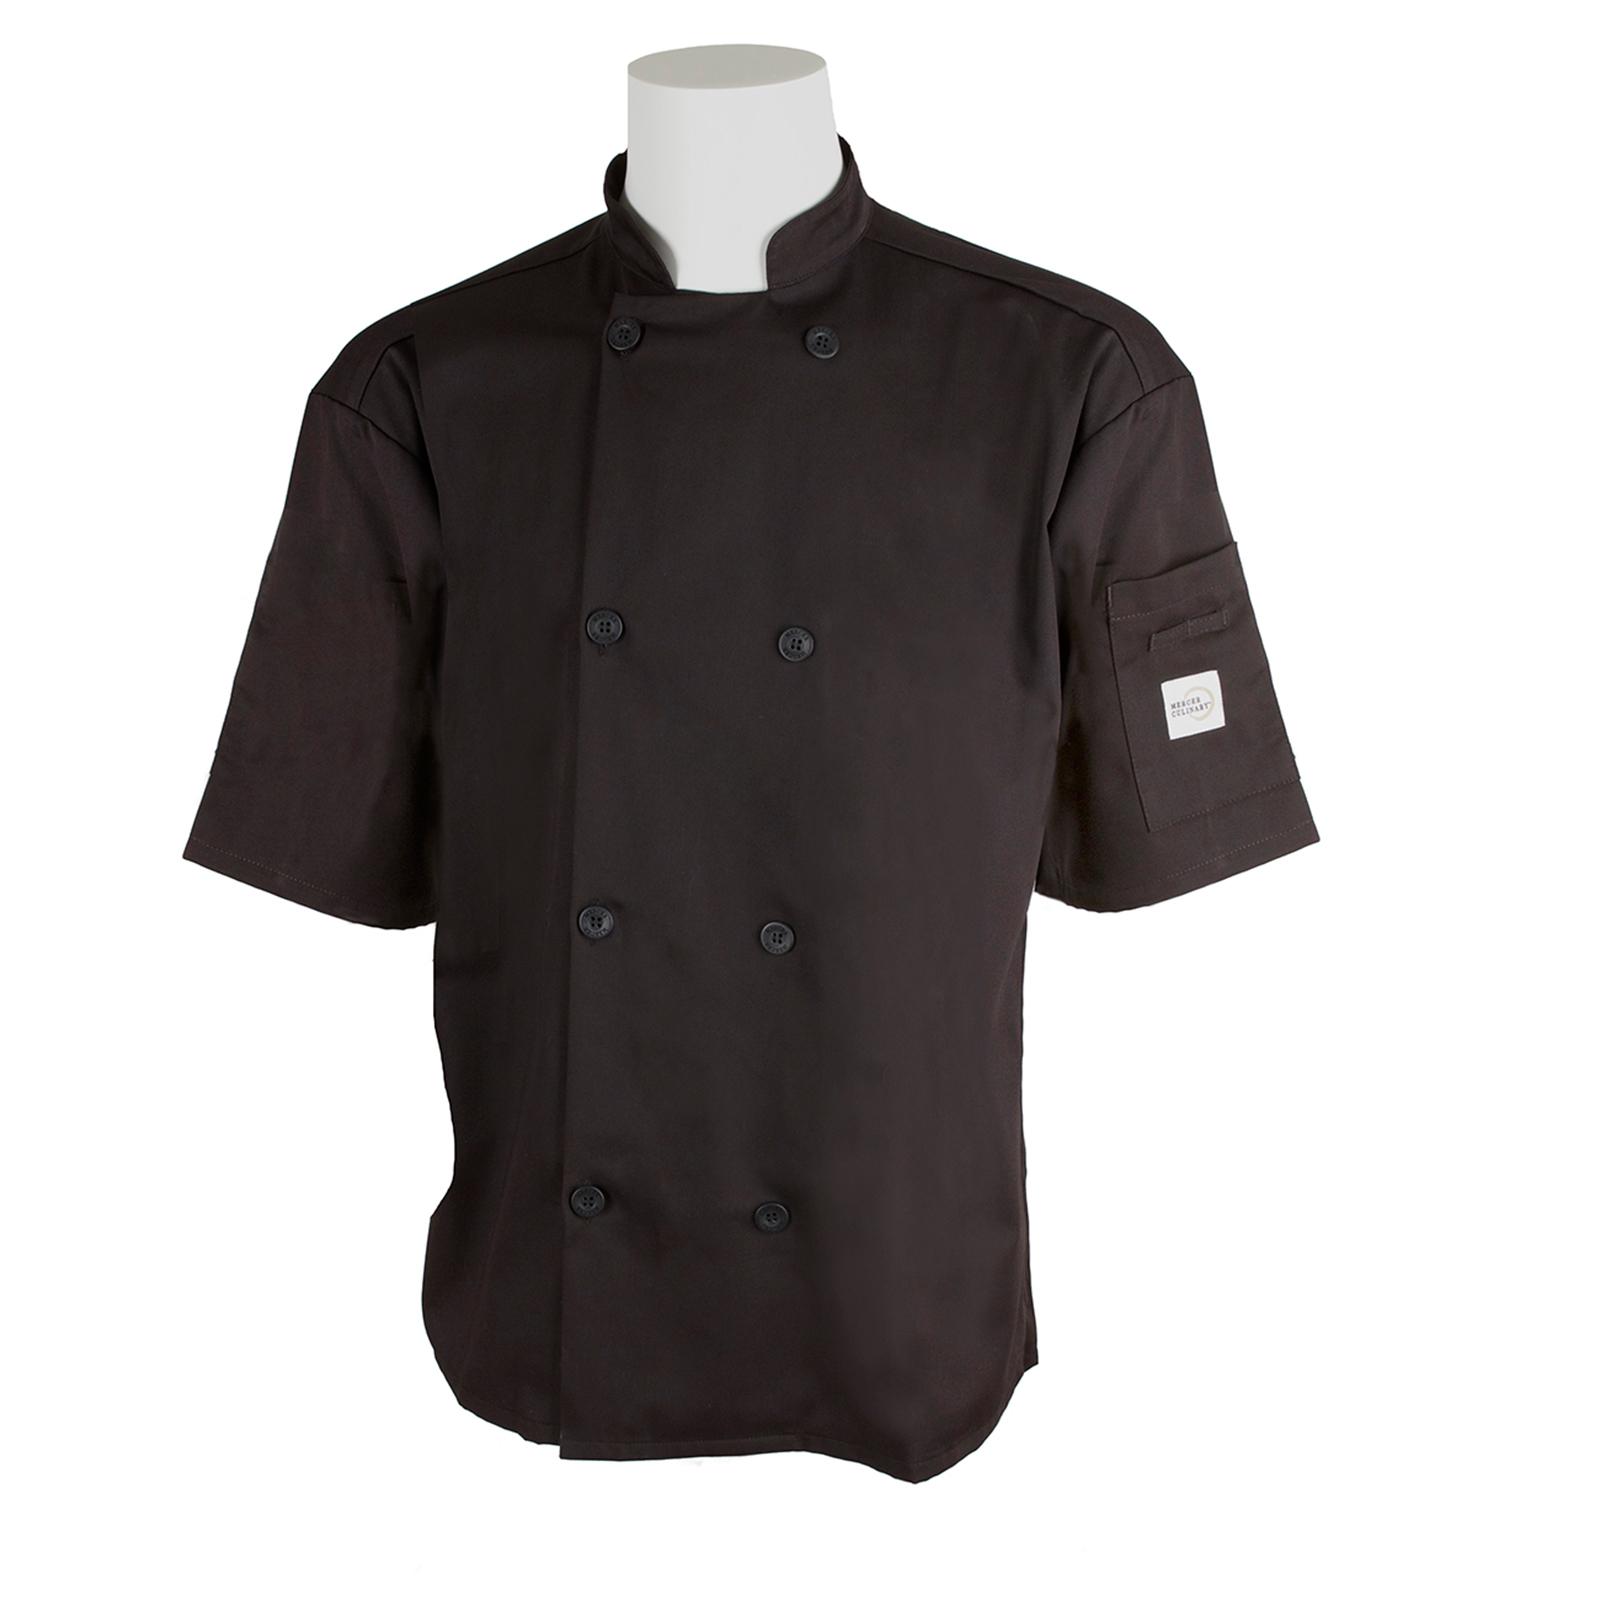 Mercer Culinary M60019BK2X chef's coat